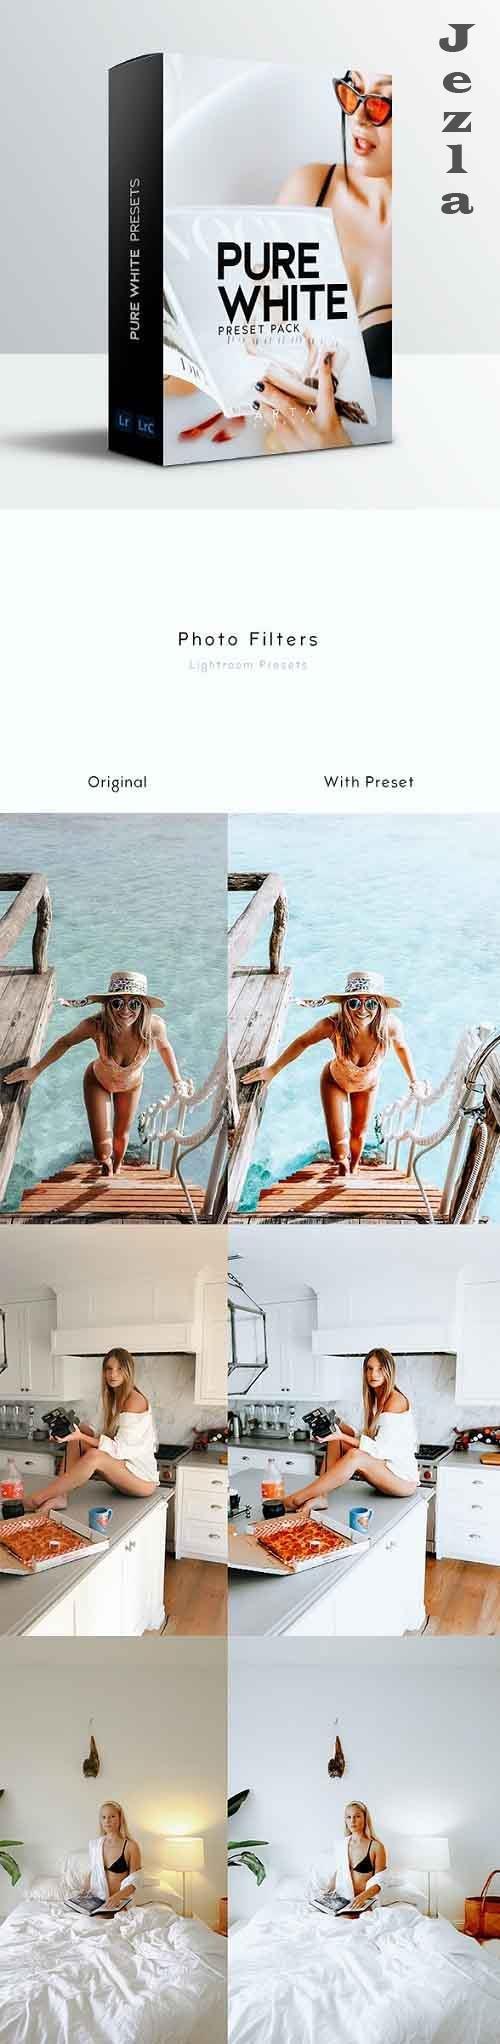 ARTA Presets | Pure White | For Mobile and Desktop LRM - 27384980